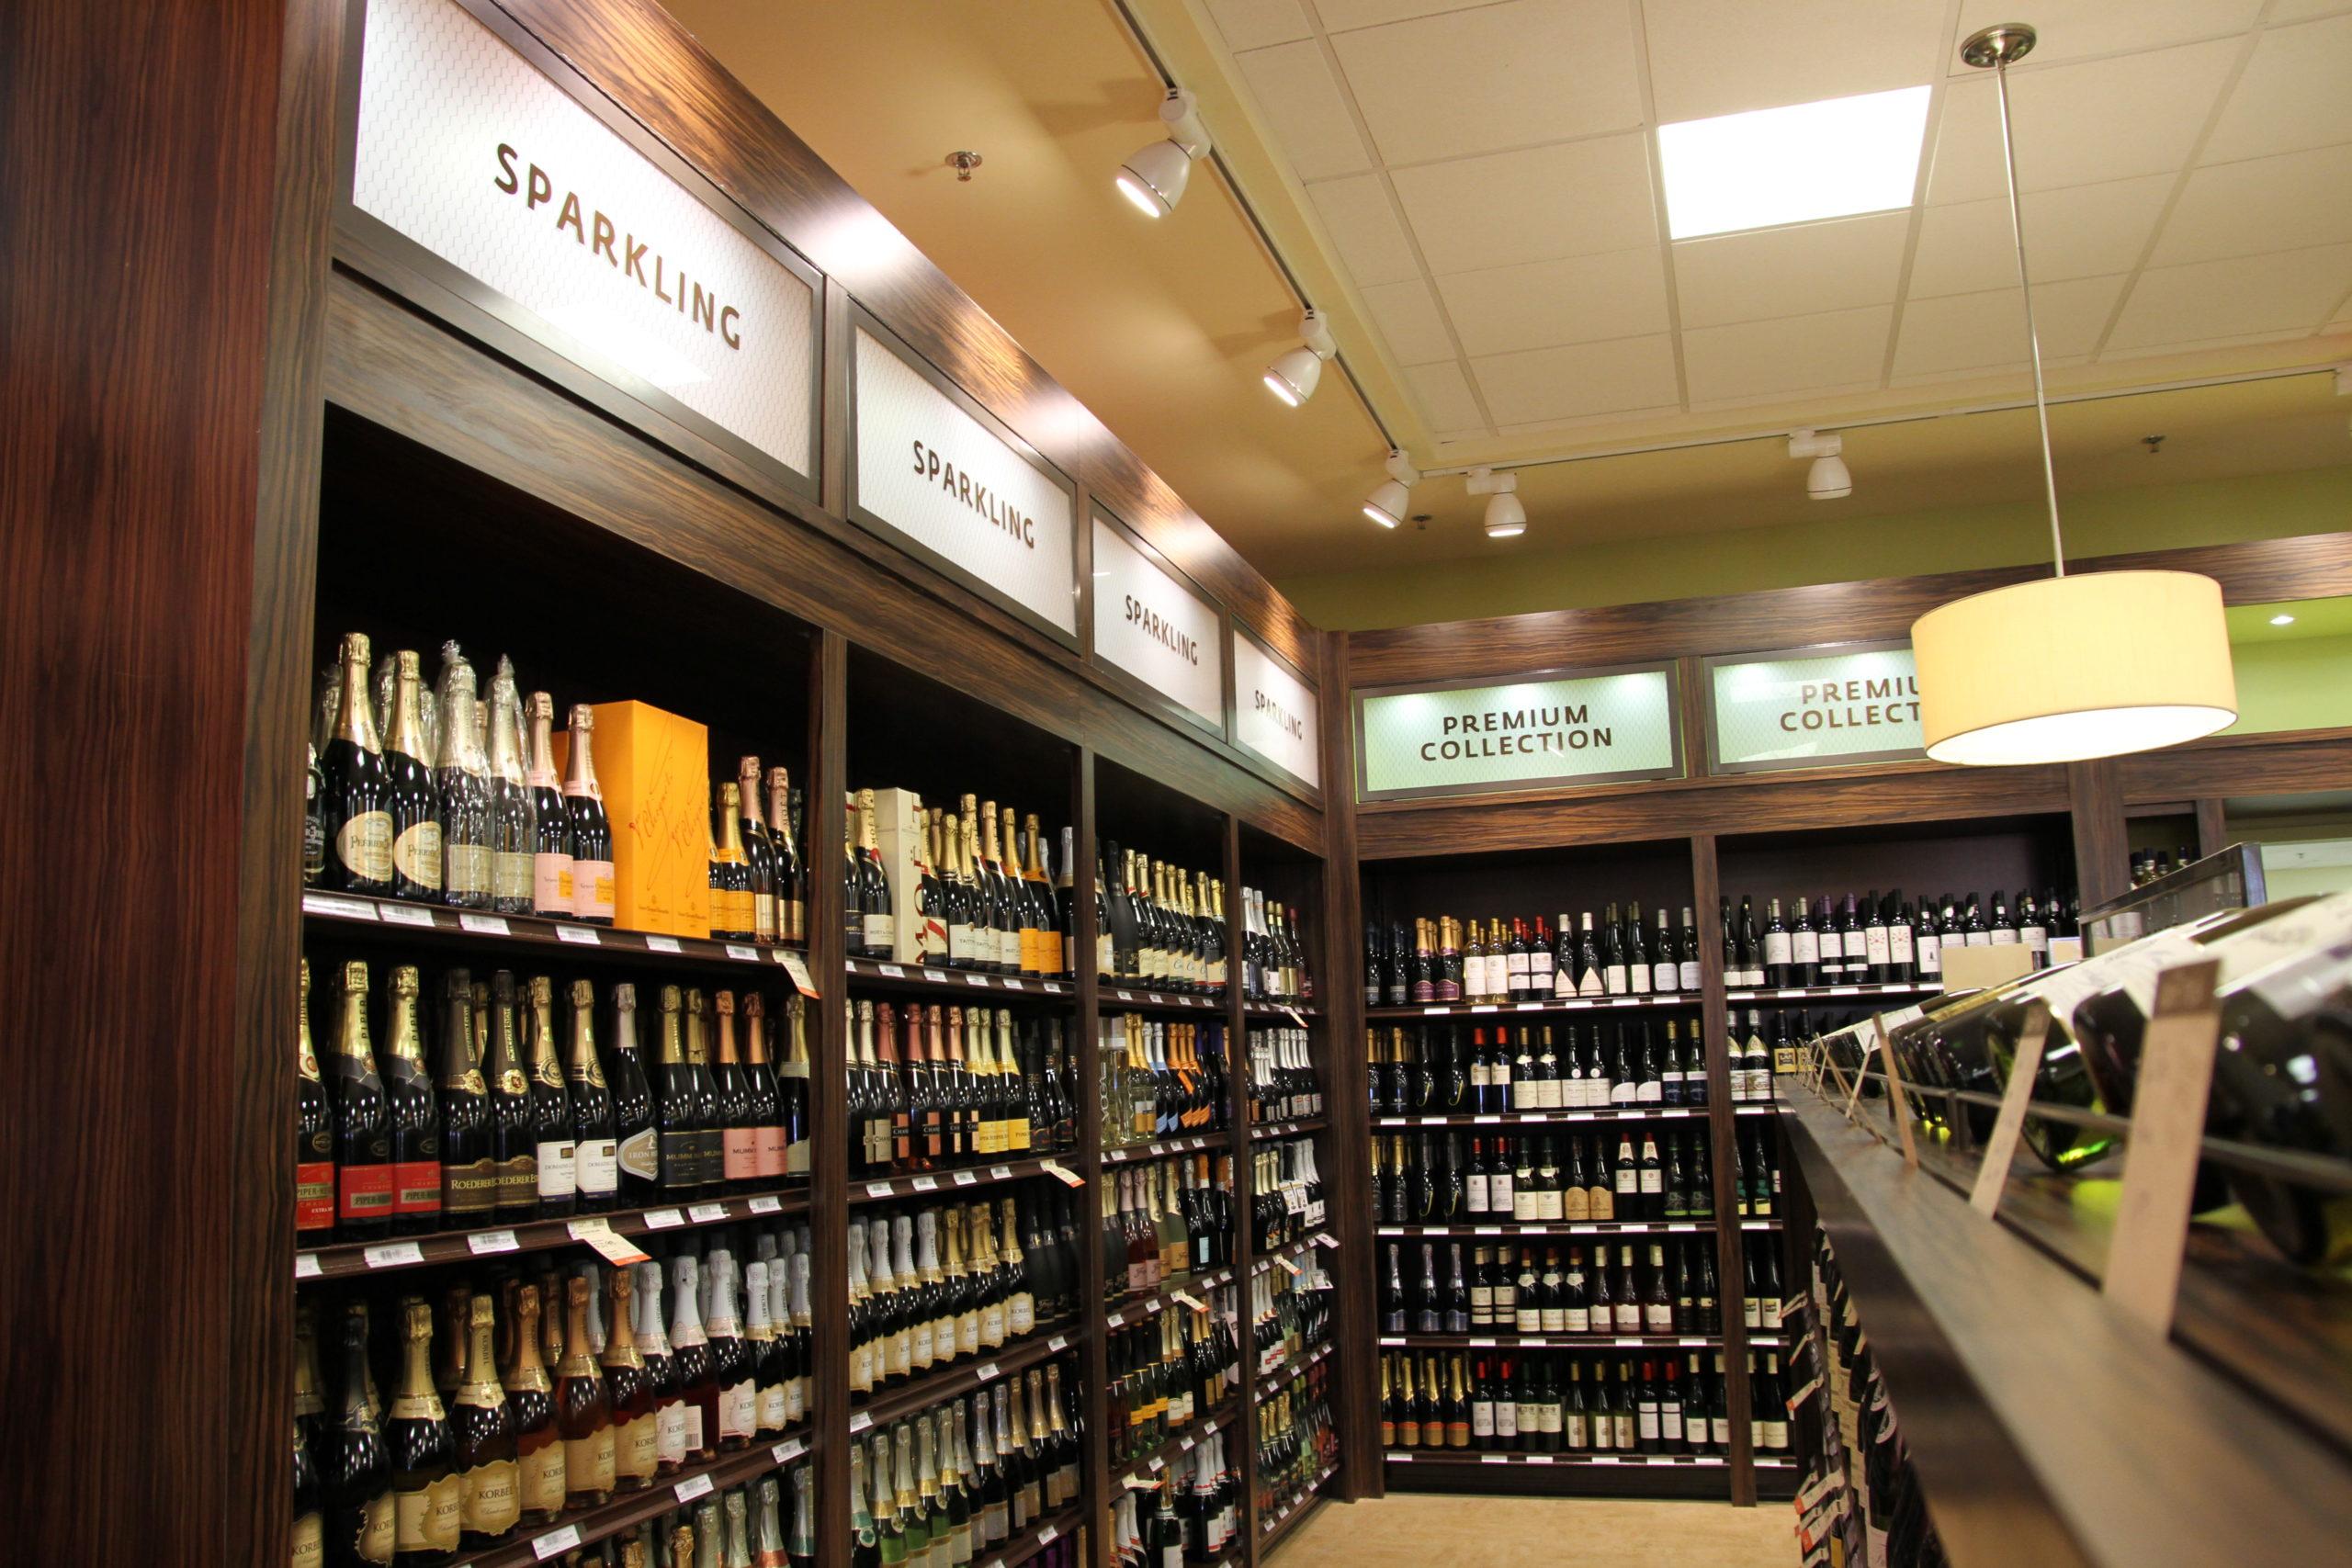 wine display, wood fixtures, retail display, signage, liquor display